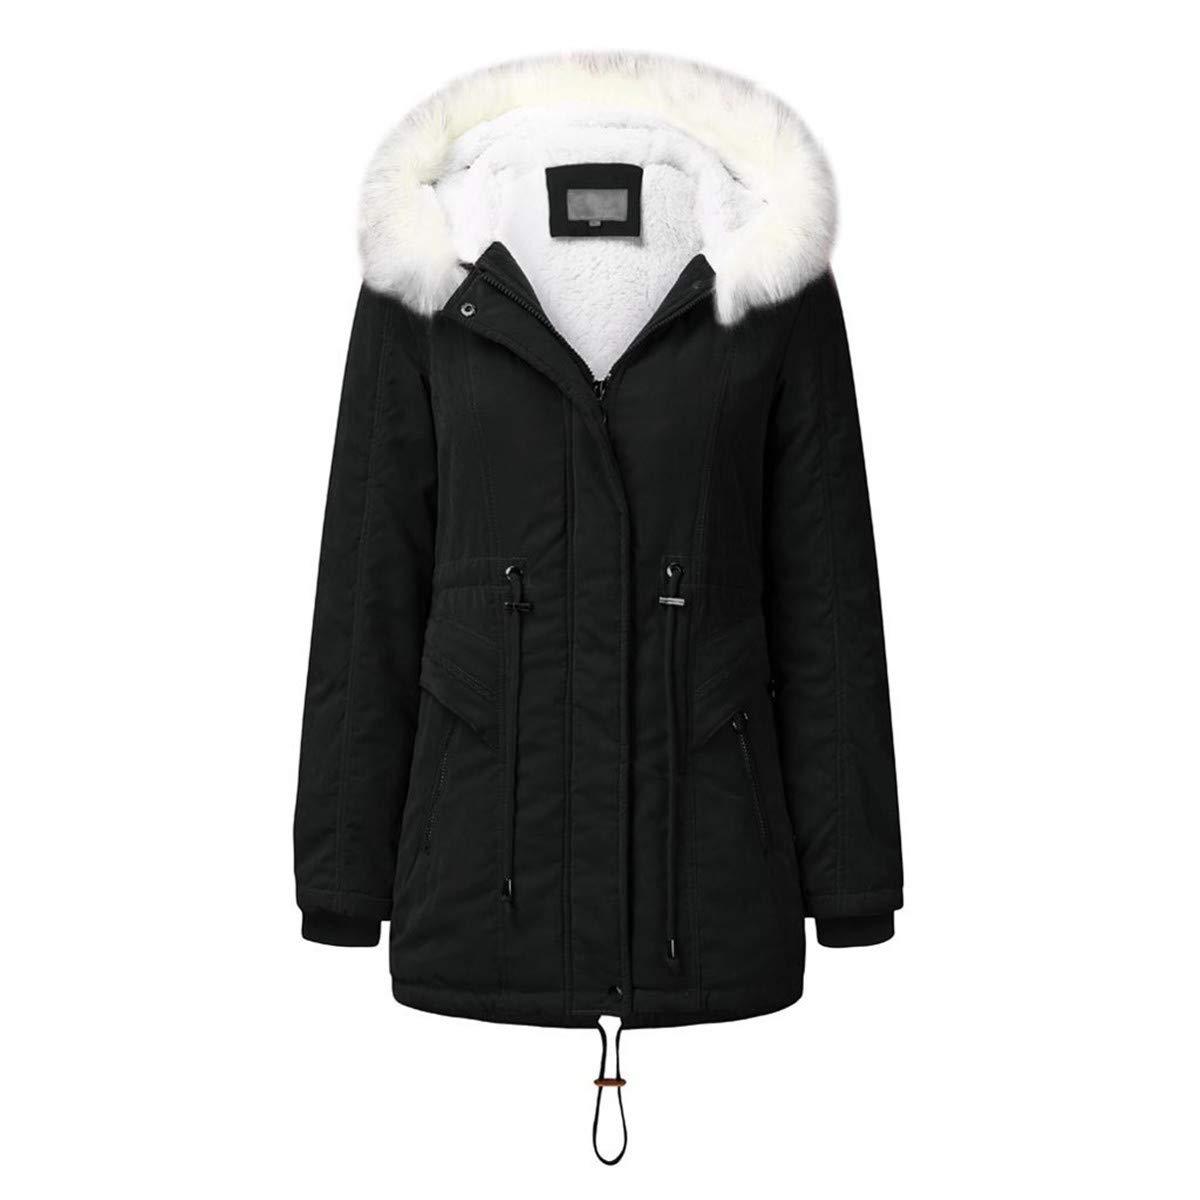 Thenxin Womens Winter Thicken Parka Jacket Warm Fleece Lined Hooded Drawstring Outwear(Black,XL) by Thenxin